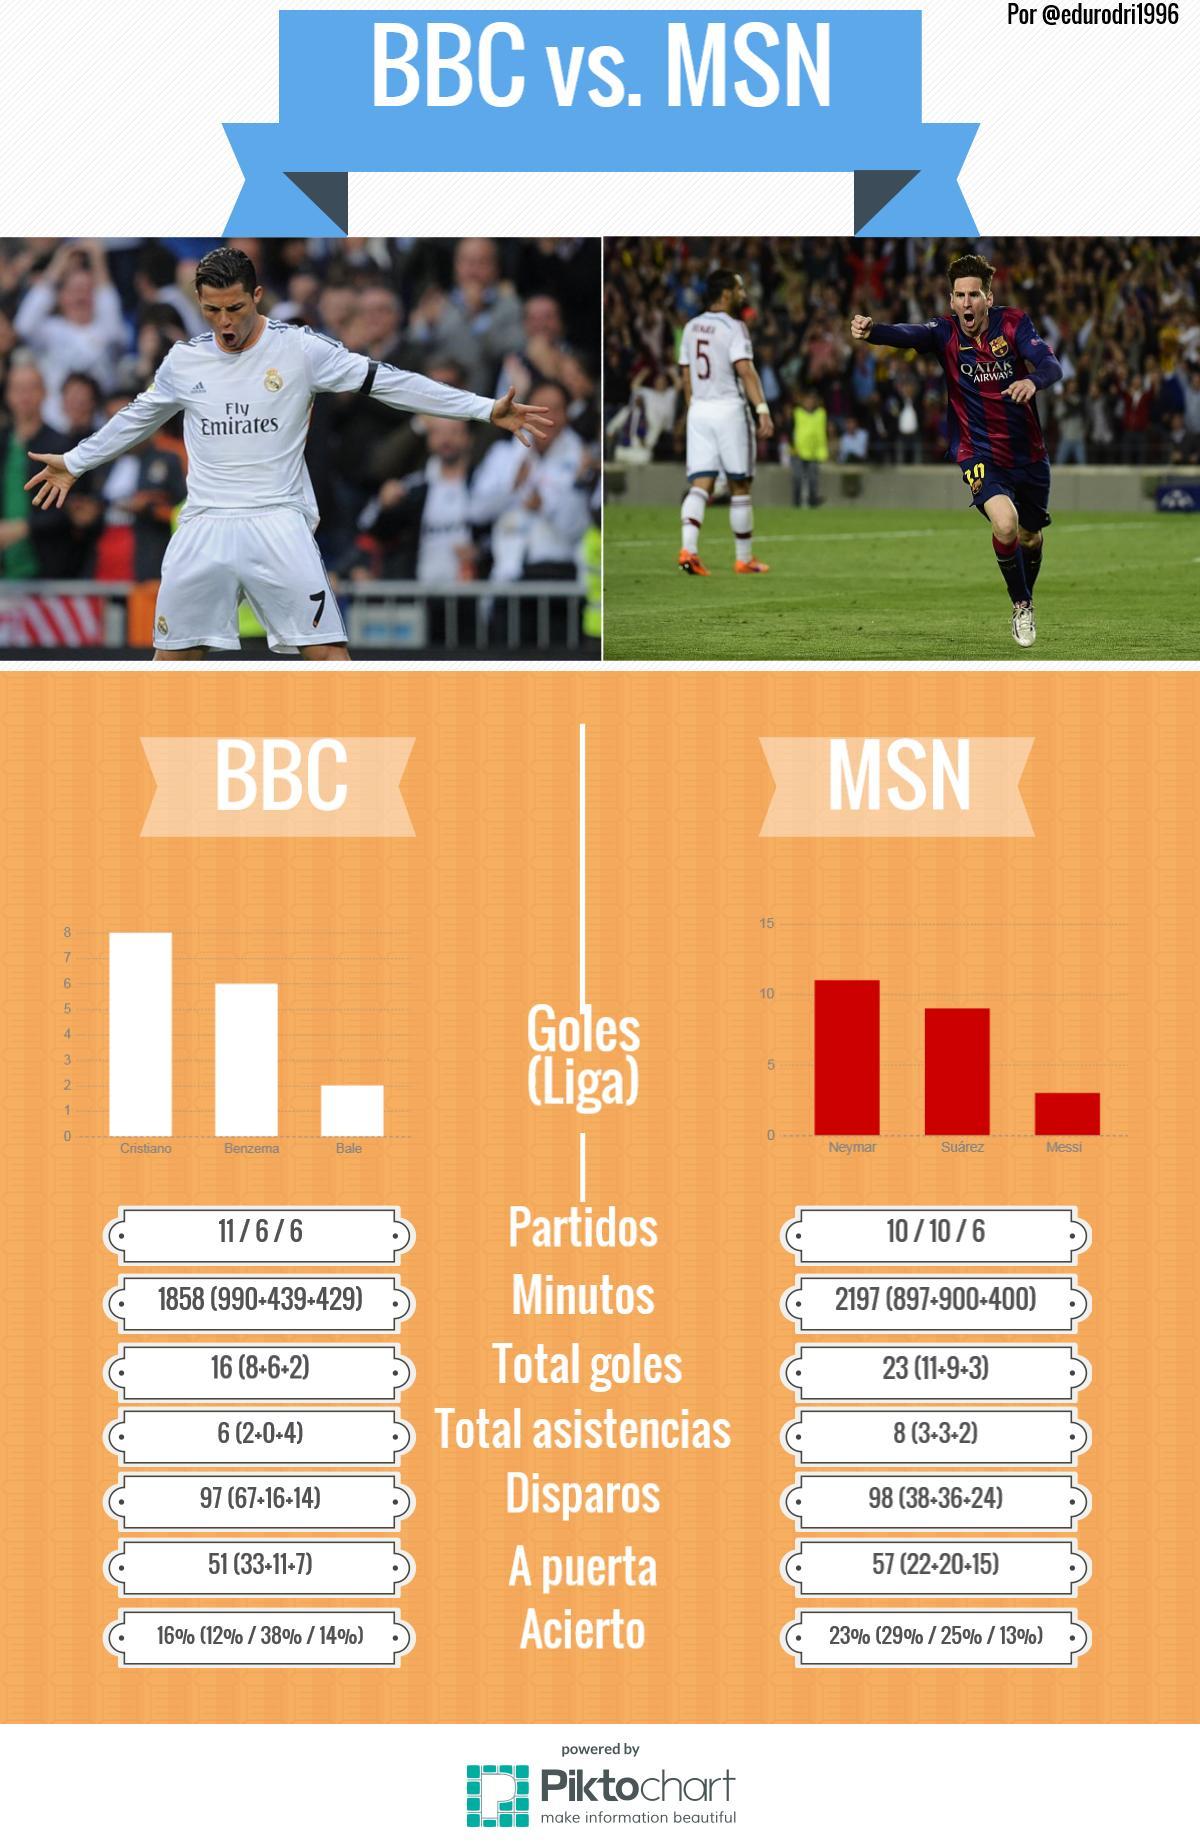 BBC vs. MSN definitivo